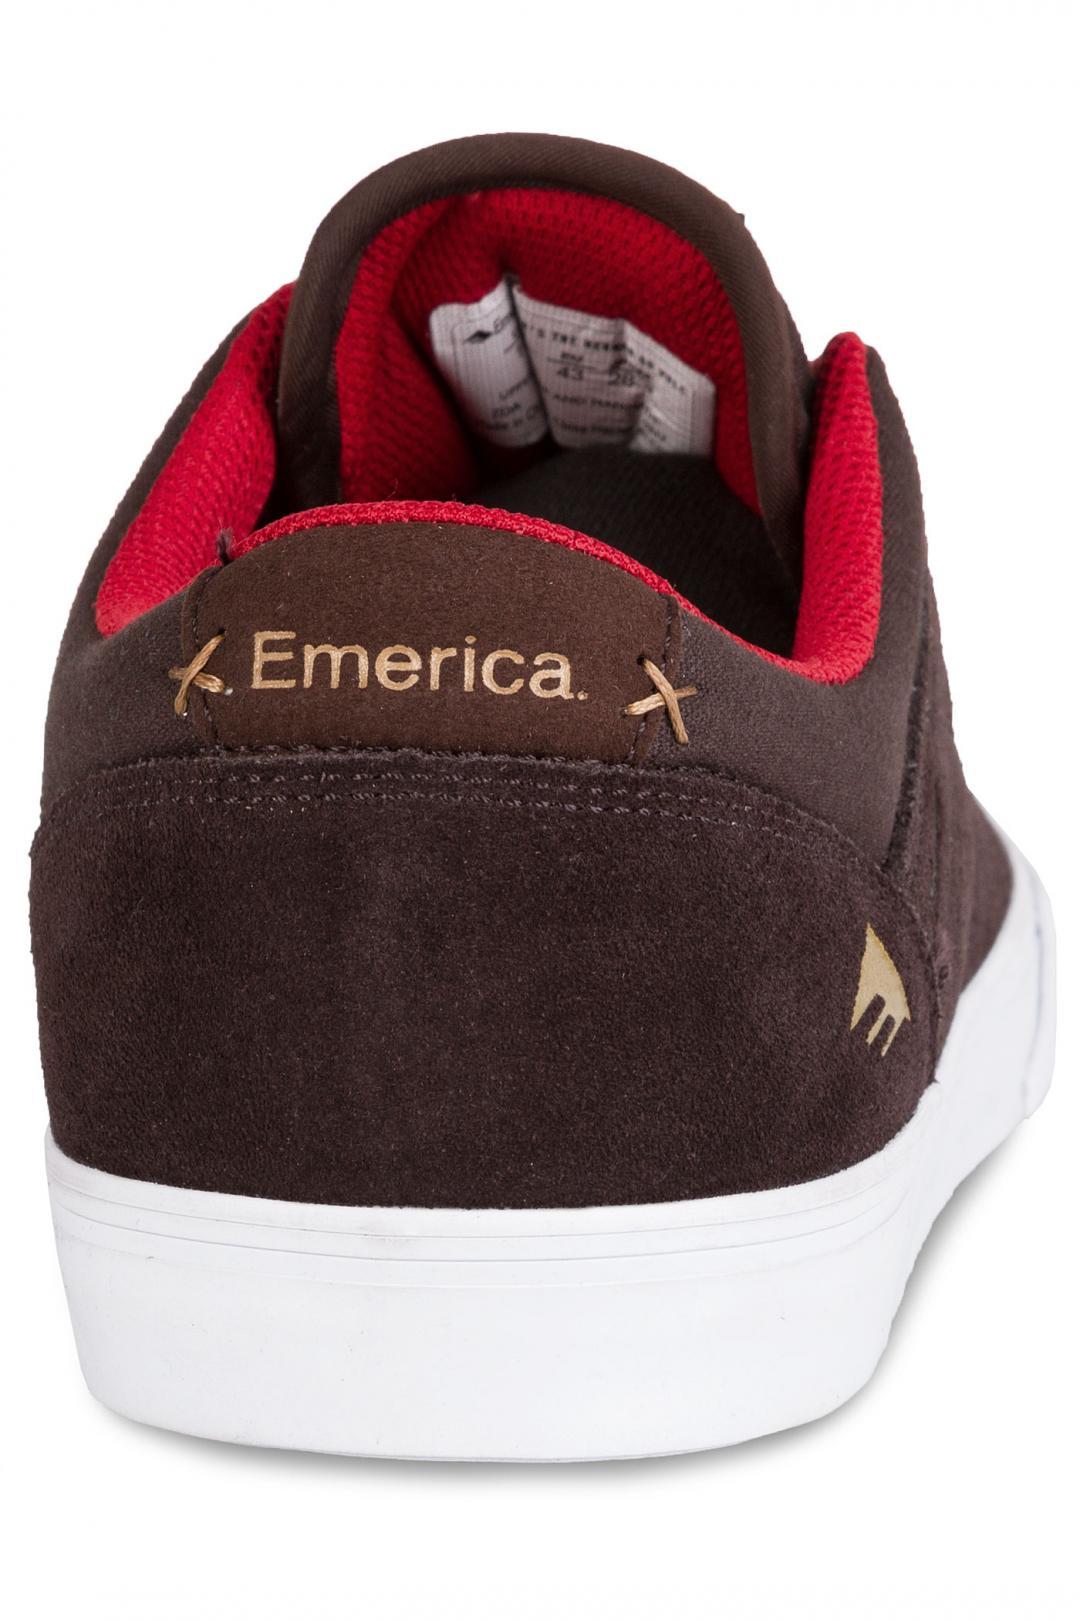 Uomo Emerica The Herman G6 Vulc brown white | Scarpe da skate